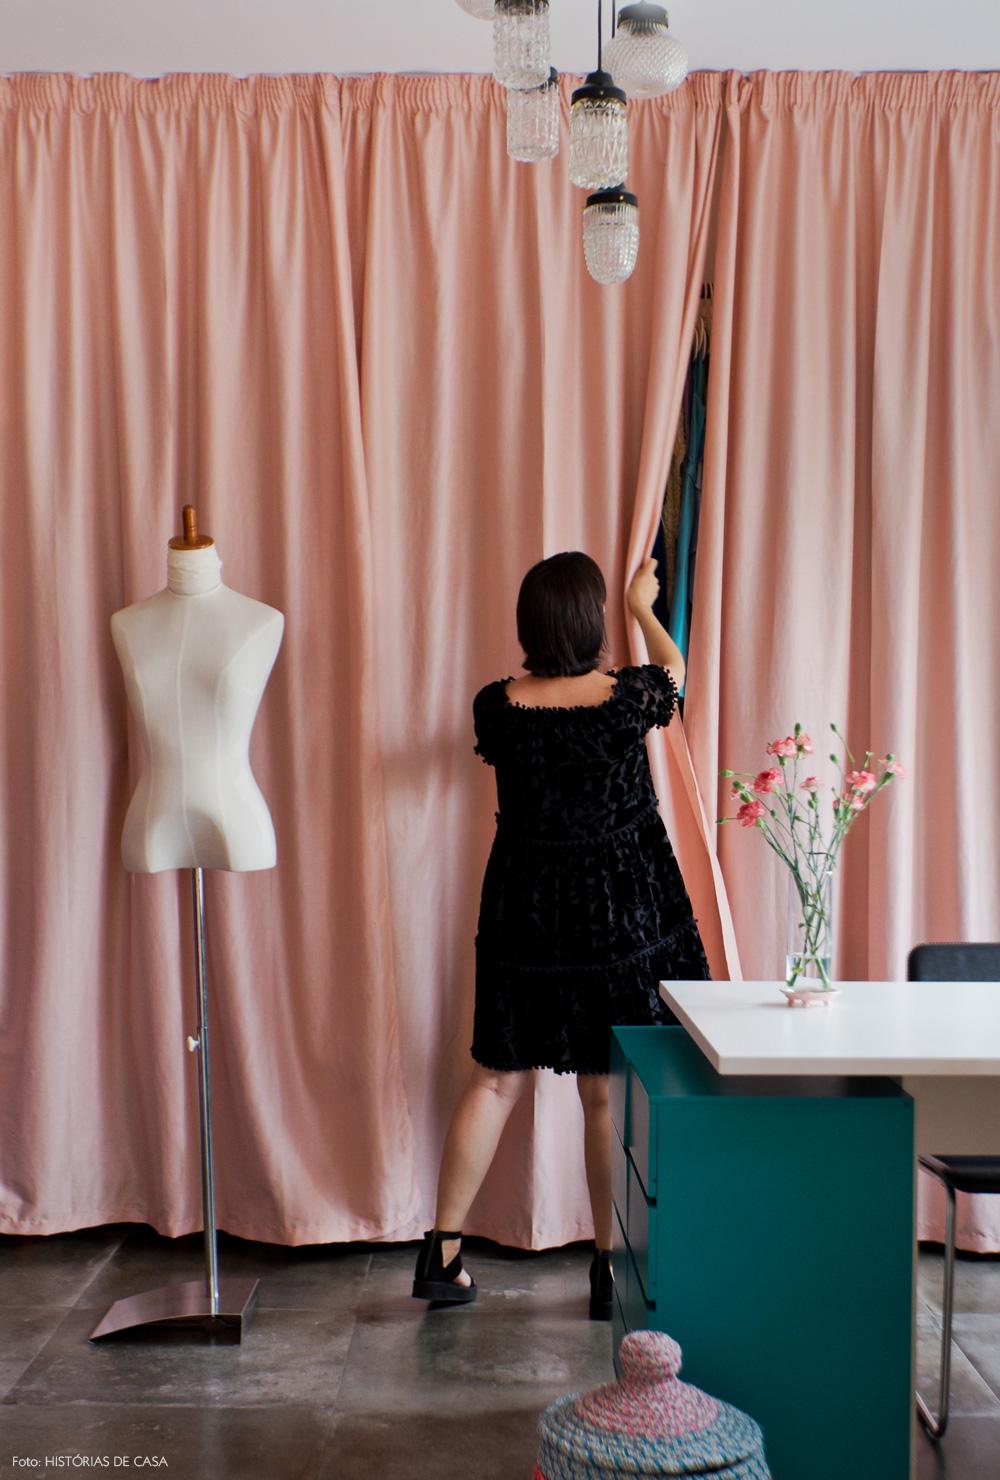 29-decoracao-atelie-figurinista-nanda-sansone-cortinas-rosa